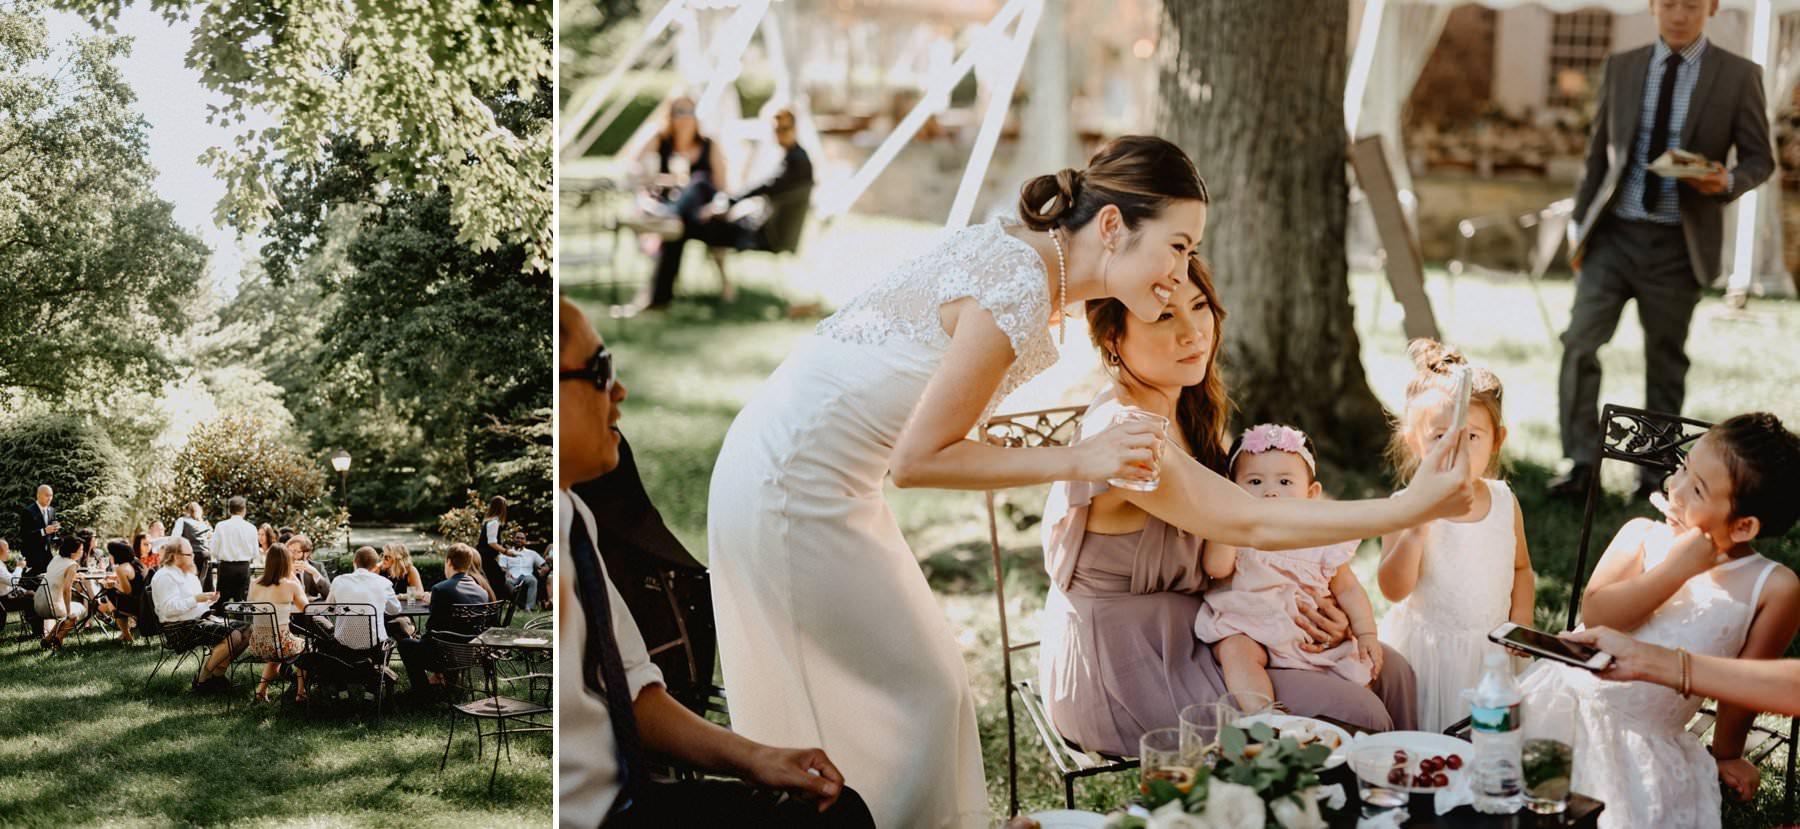 Appleford-estate-wedding-111.jpg